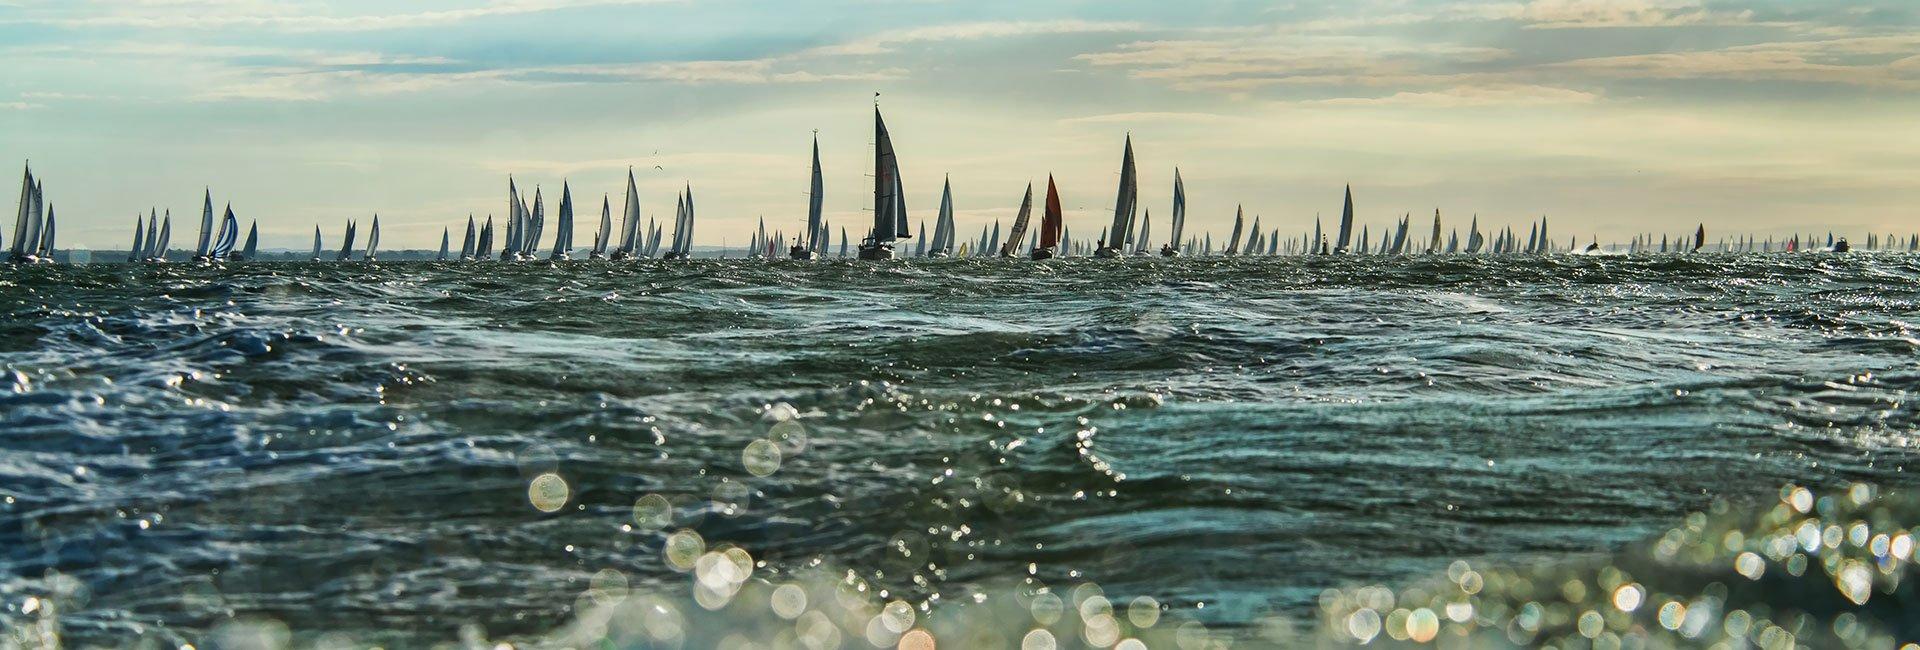 5_Ocean_Race